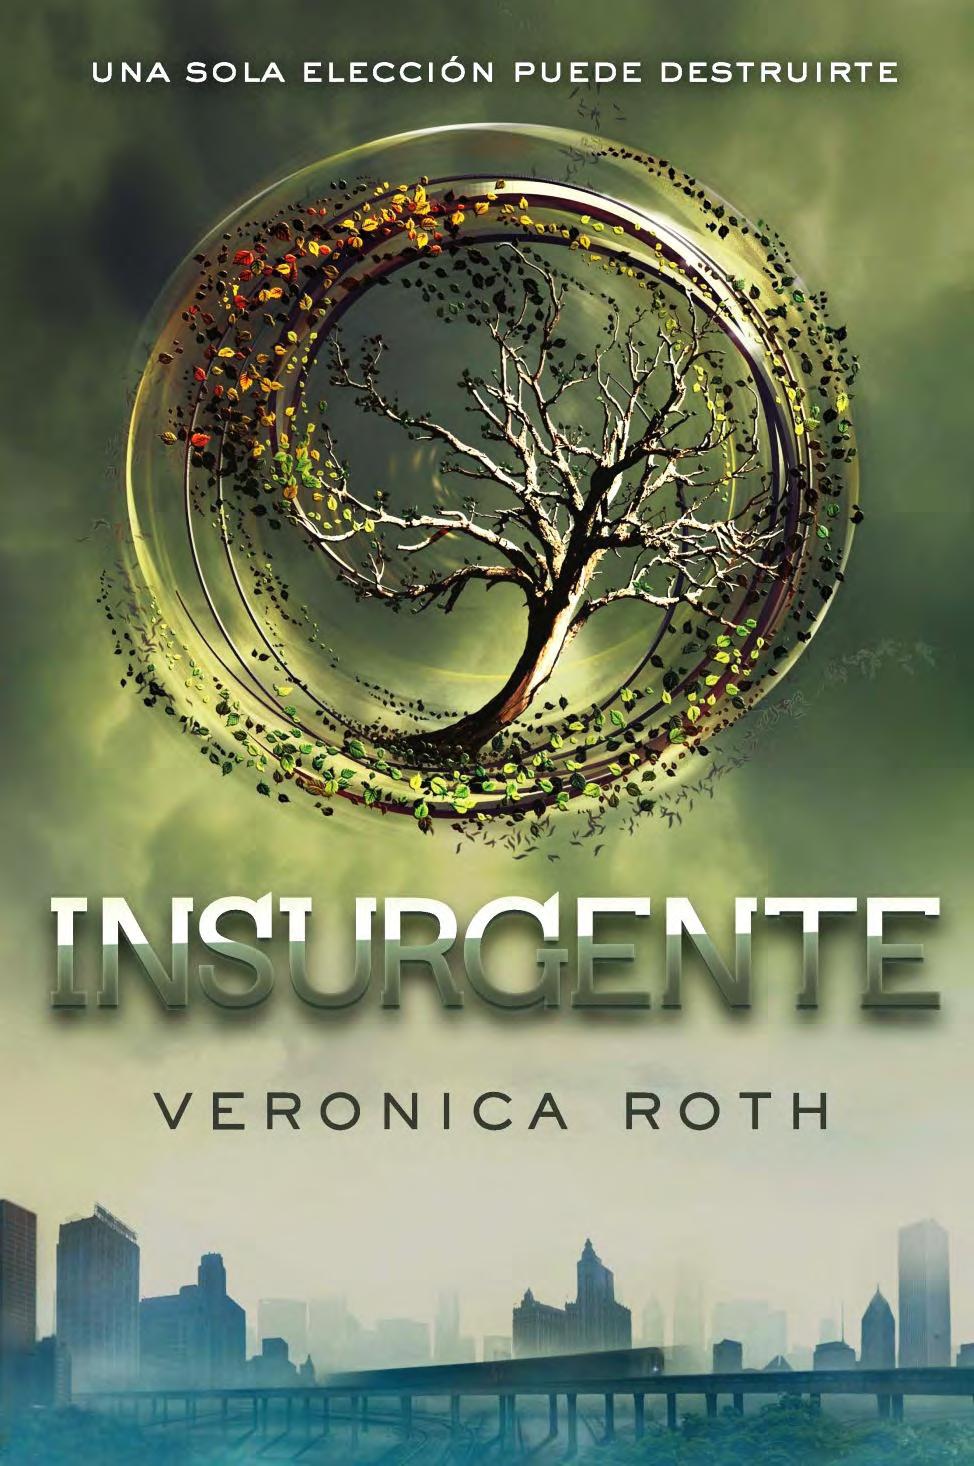 http://labibliotecadebella.blogspot.com.es/2016/02/insurgente-veronica-roth.html